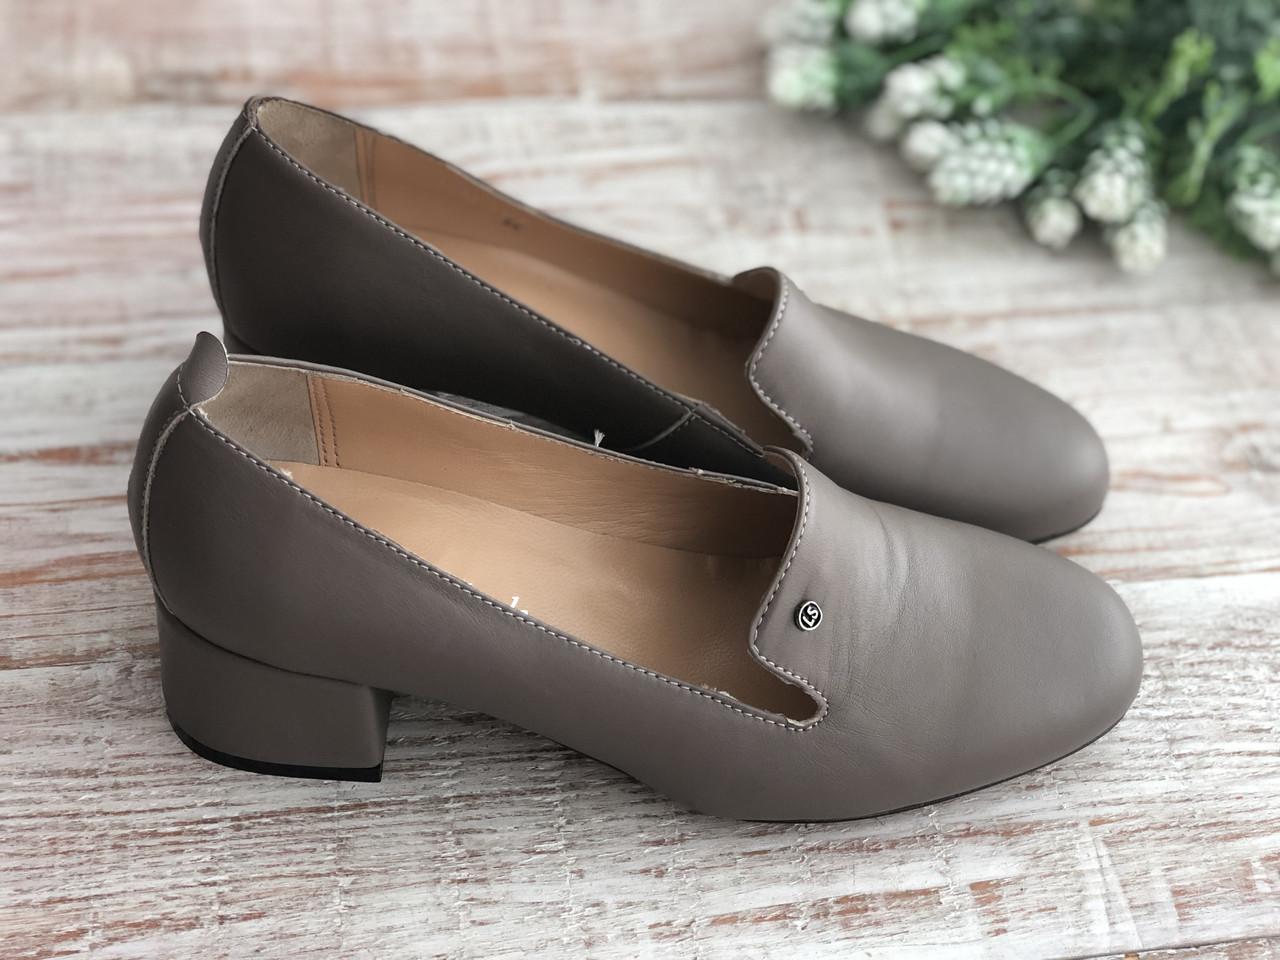 Кожаные Женские туфли 3179 беж размеры 35-40